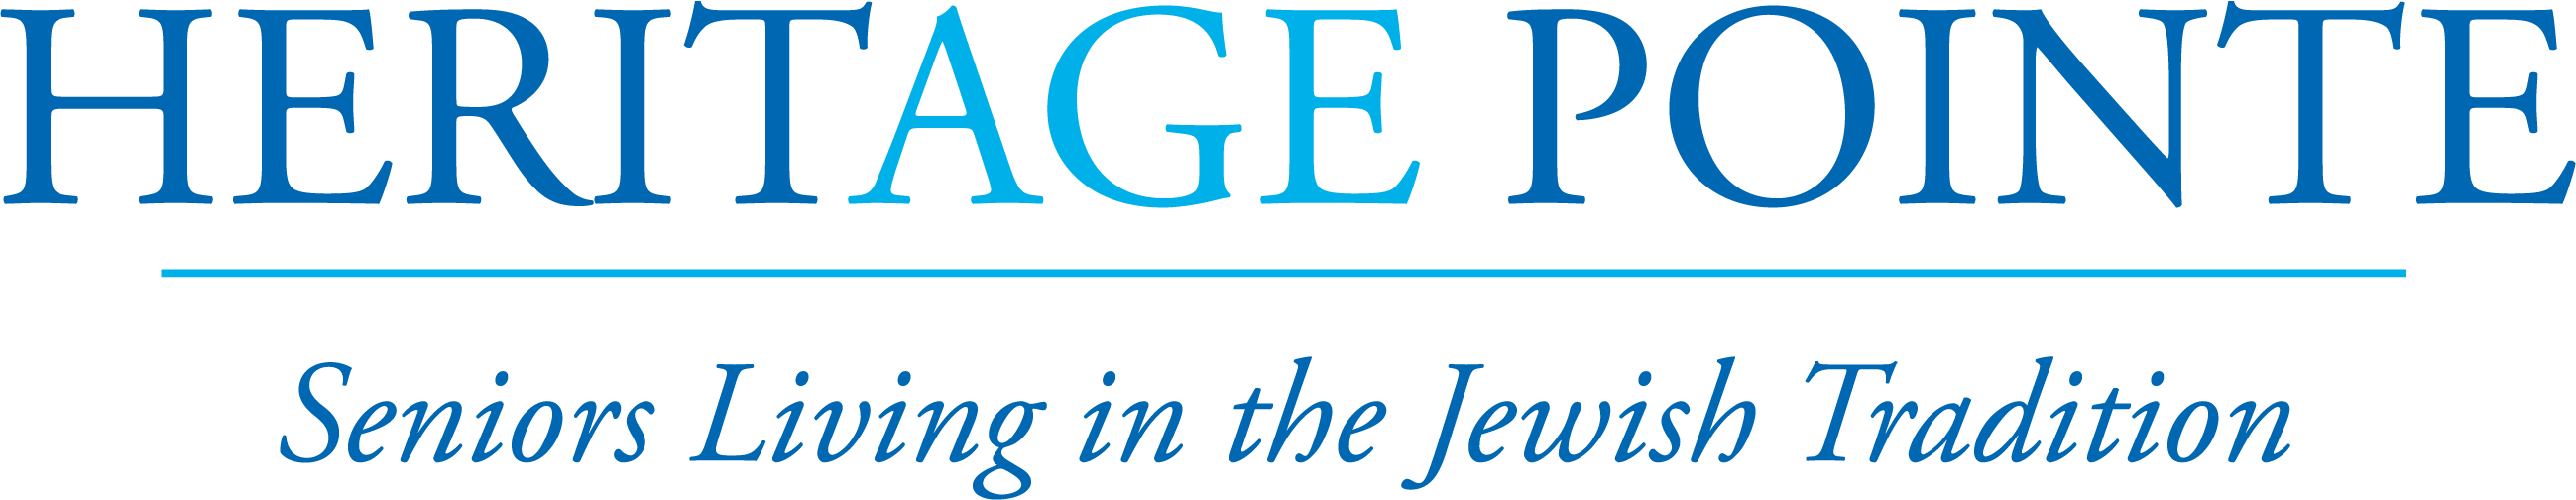 heritage pointe logo in dark blue age in light blue